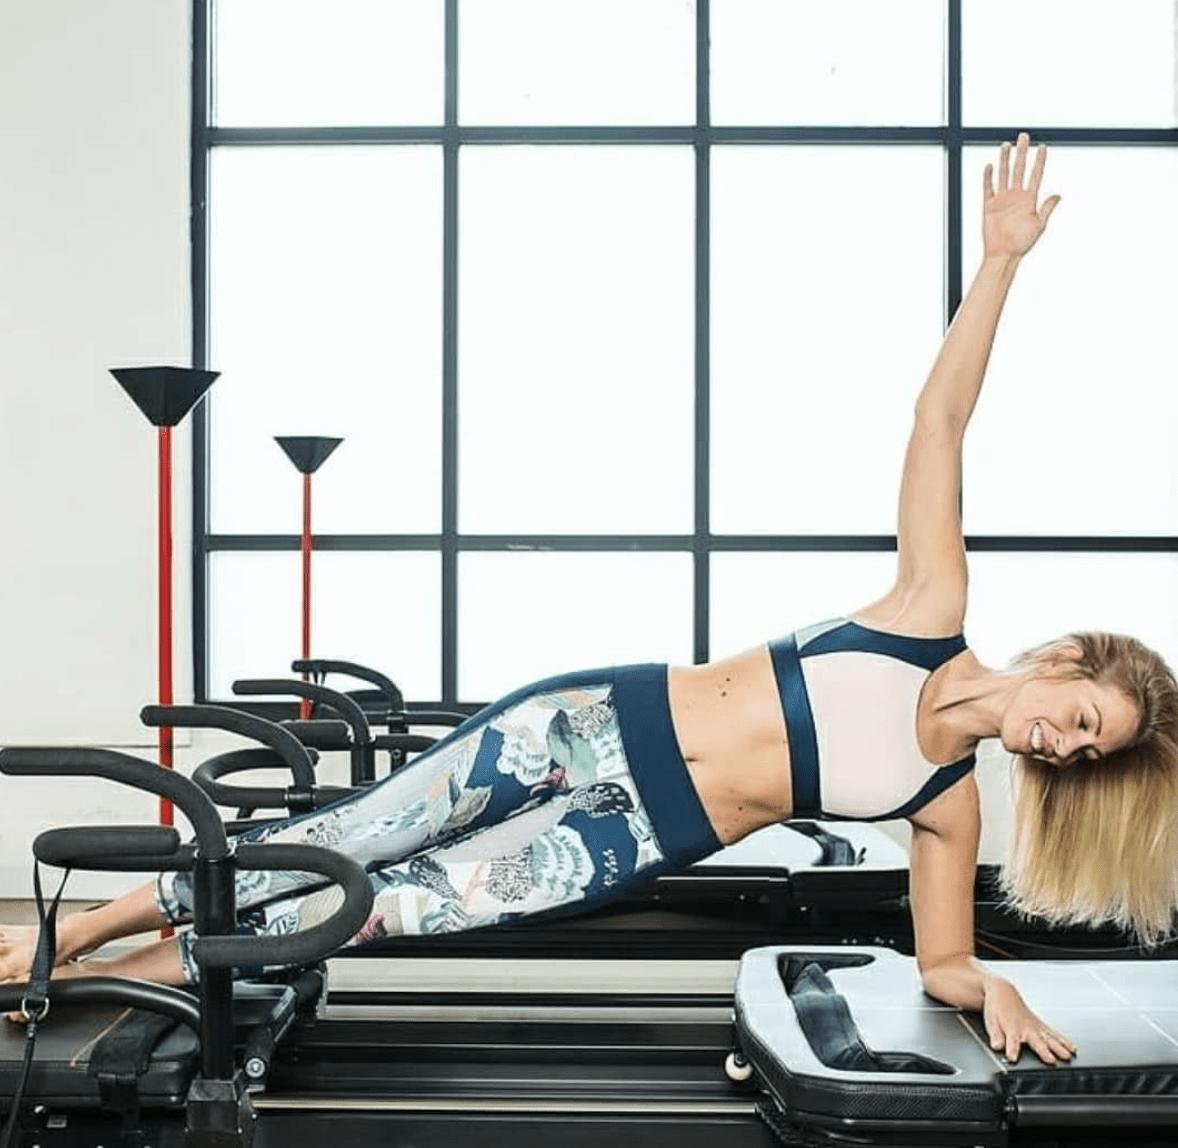 studio lagree pilates reformer edit seven toronto 2018